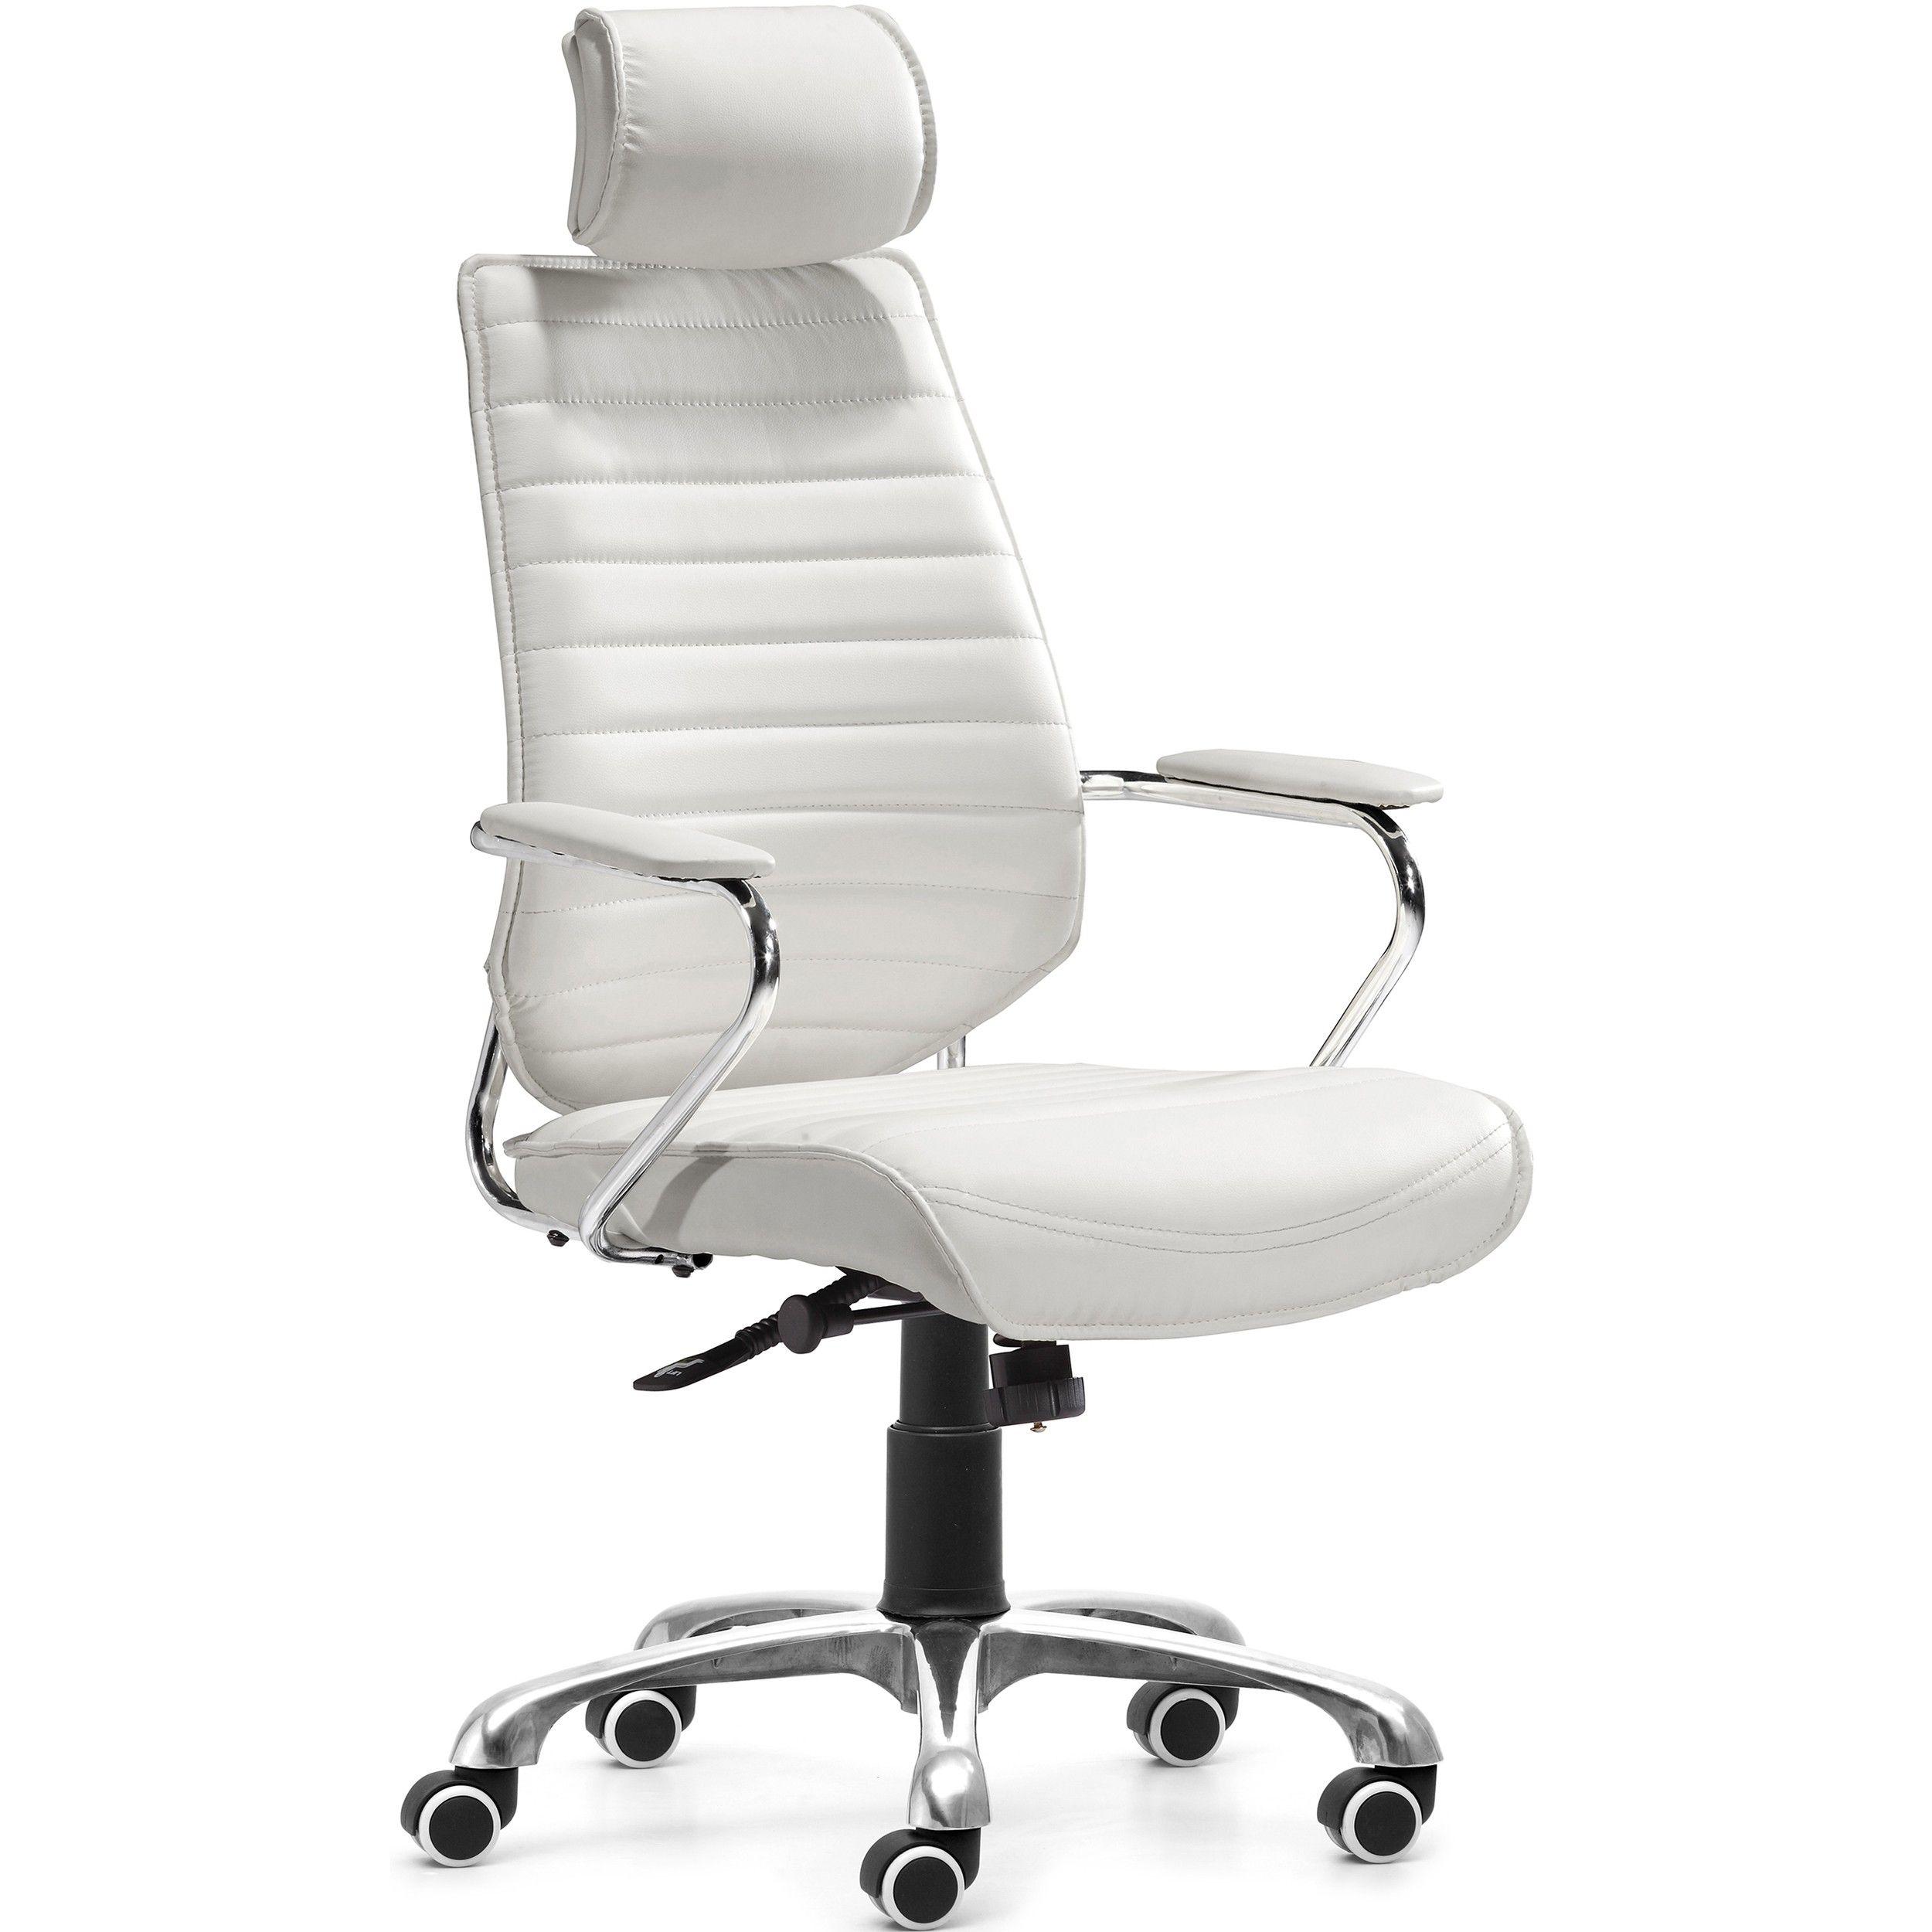 Enterprise high back office chair white 20900 high